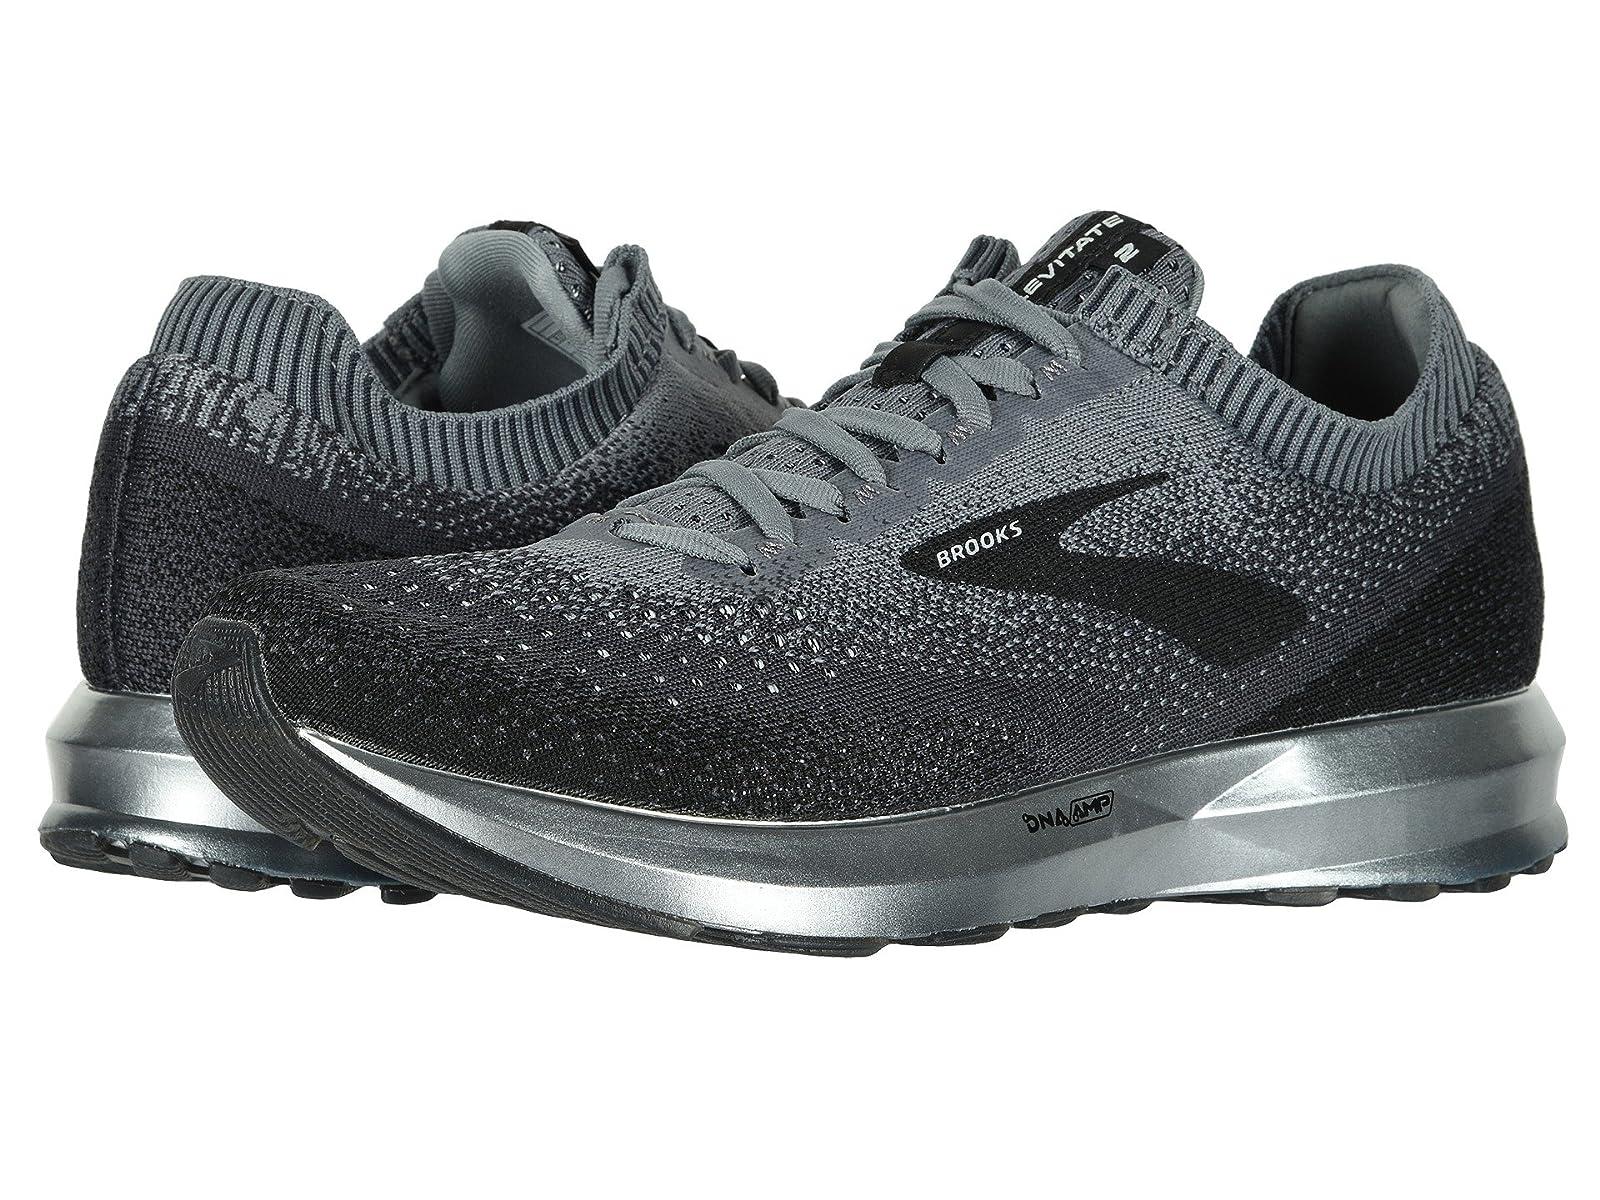 Brooks Levitate 2Atmospheric grades have affordable shoes